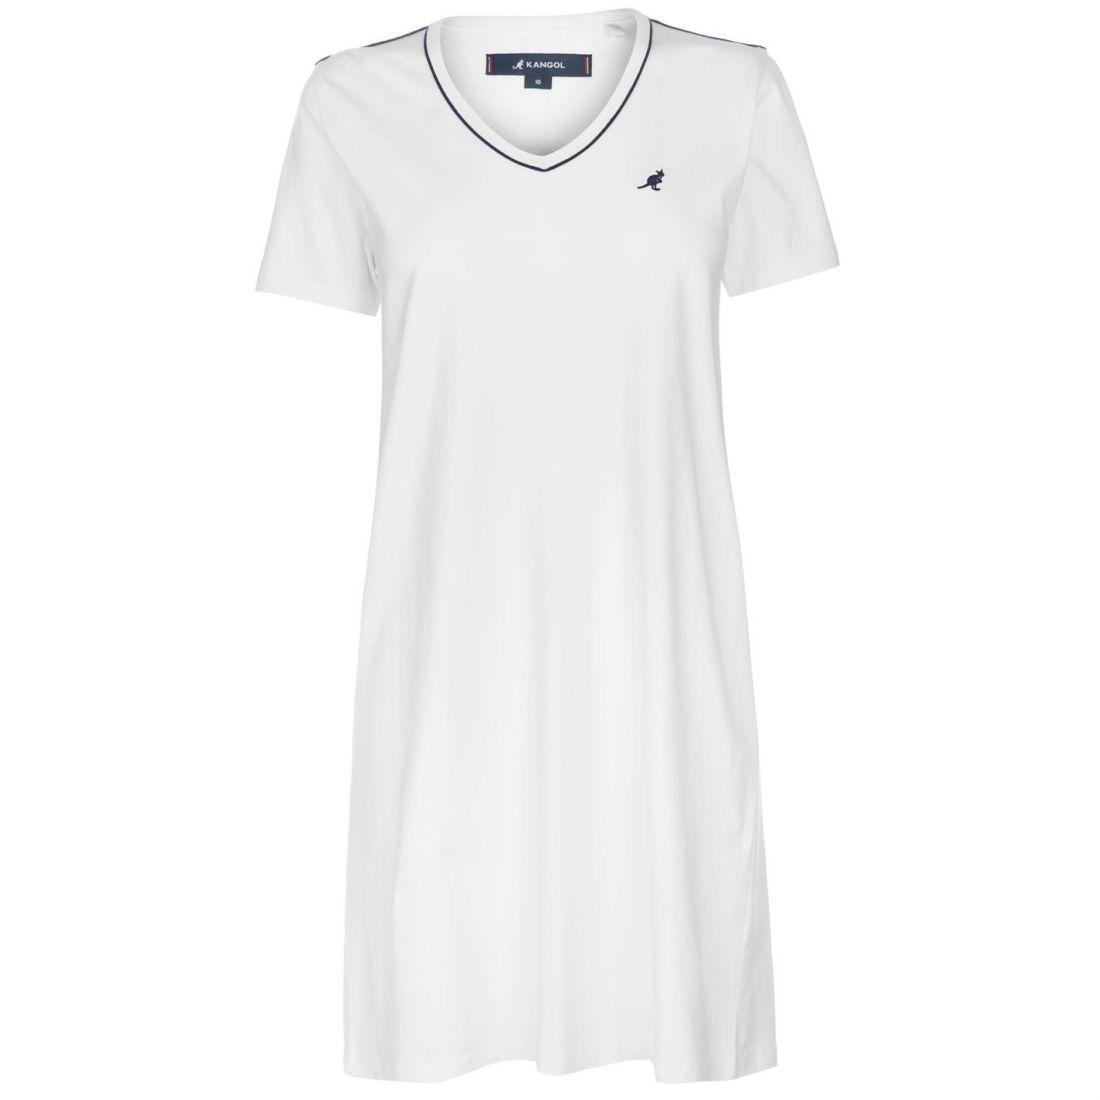 88120be08b860 Kangol V Neck T Shirt Dress Ladies Tunics Tee Top Short Sleeve ...